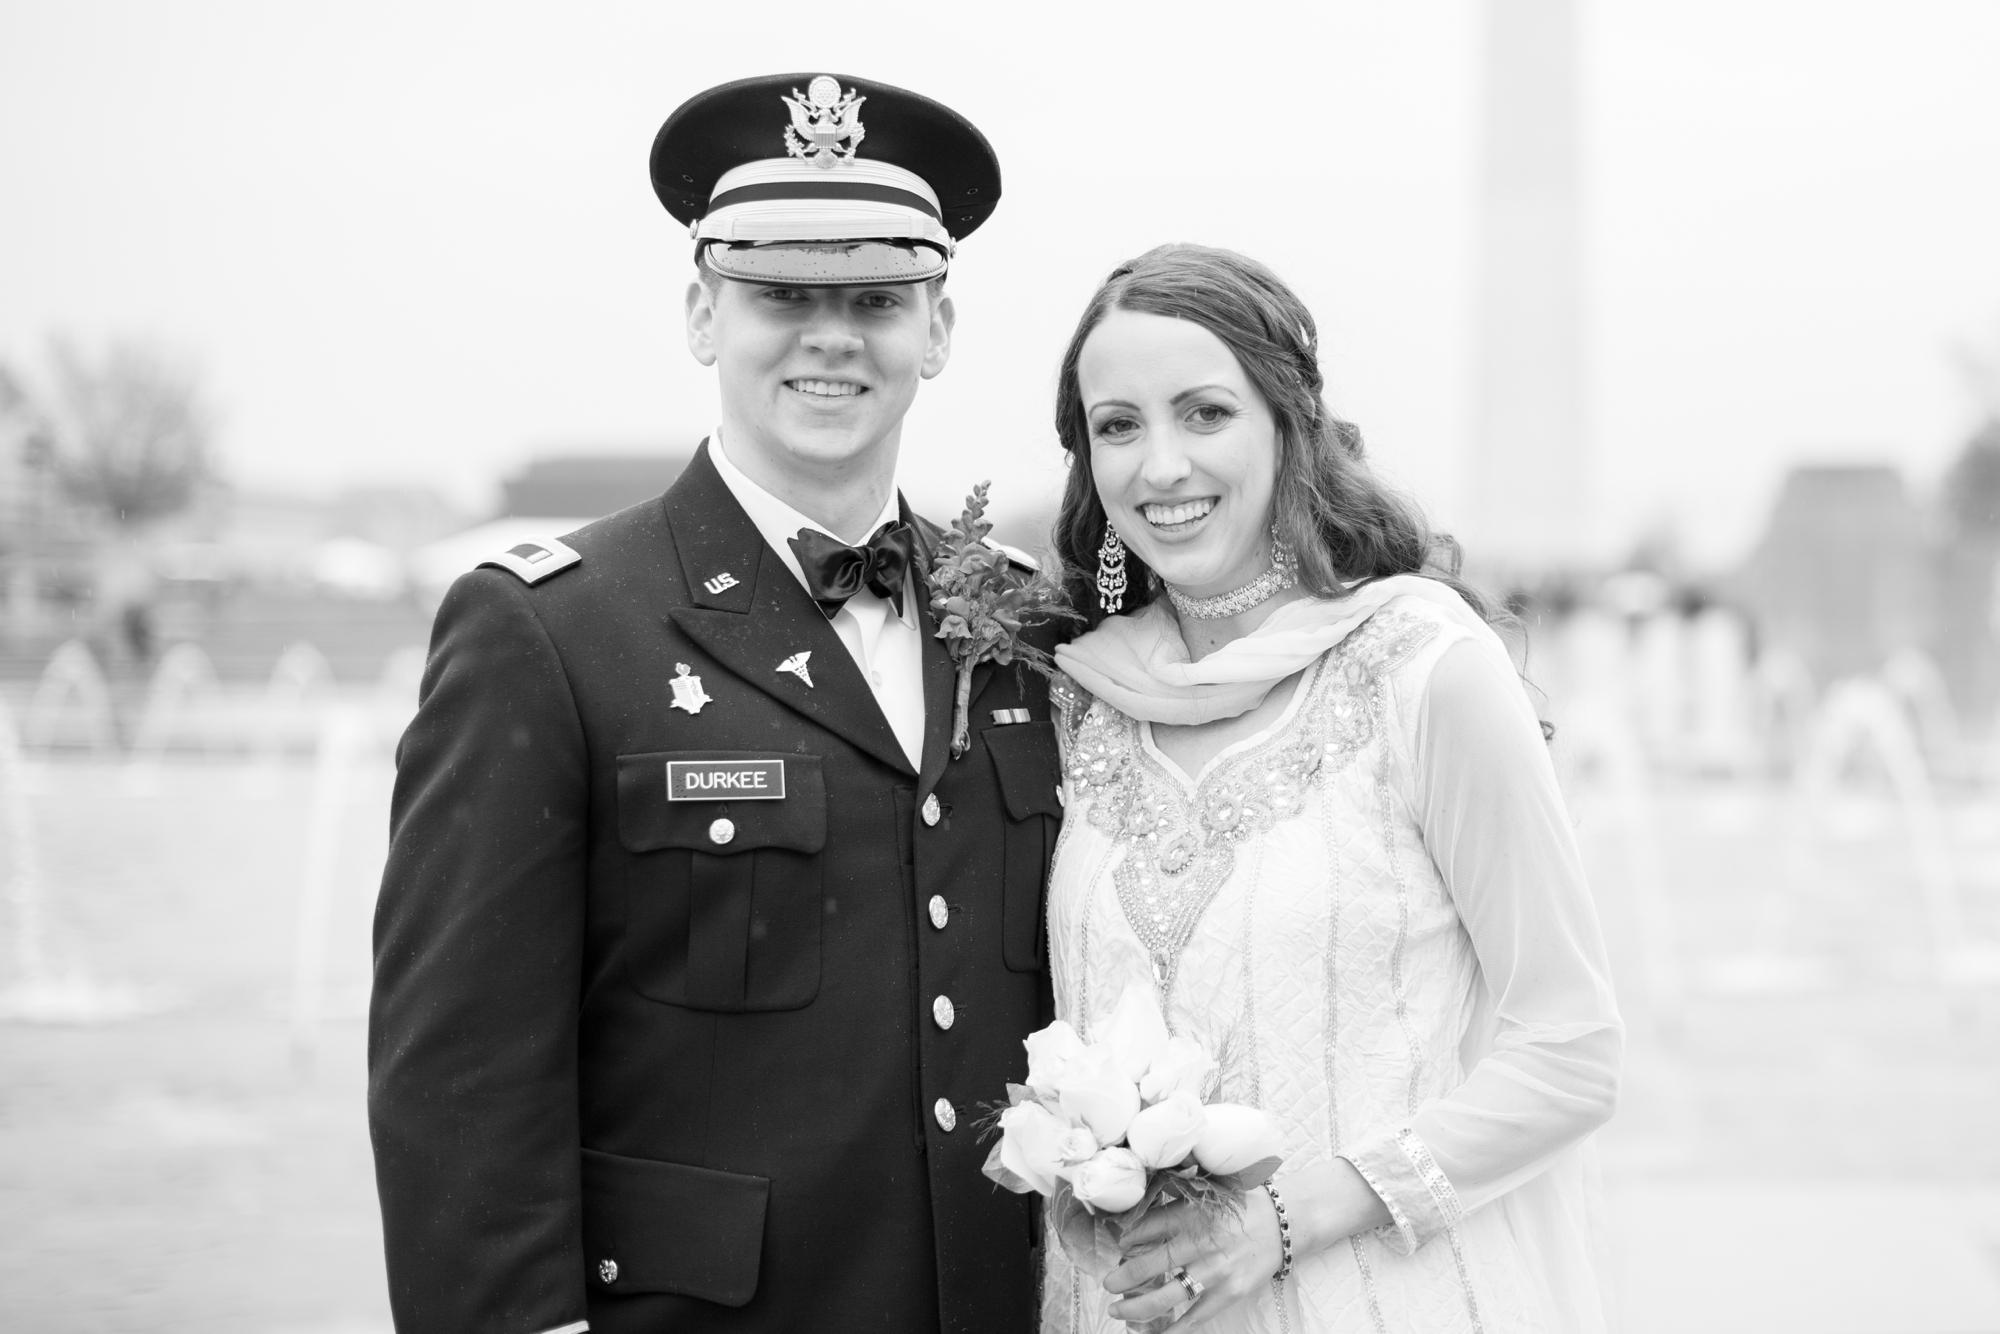 2. Durkee Wedding Bride & Groom Portraits-411_anna grace photography virginia wedding photographer dc war memorial washington dc photo.jpg